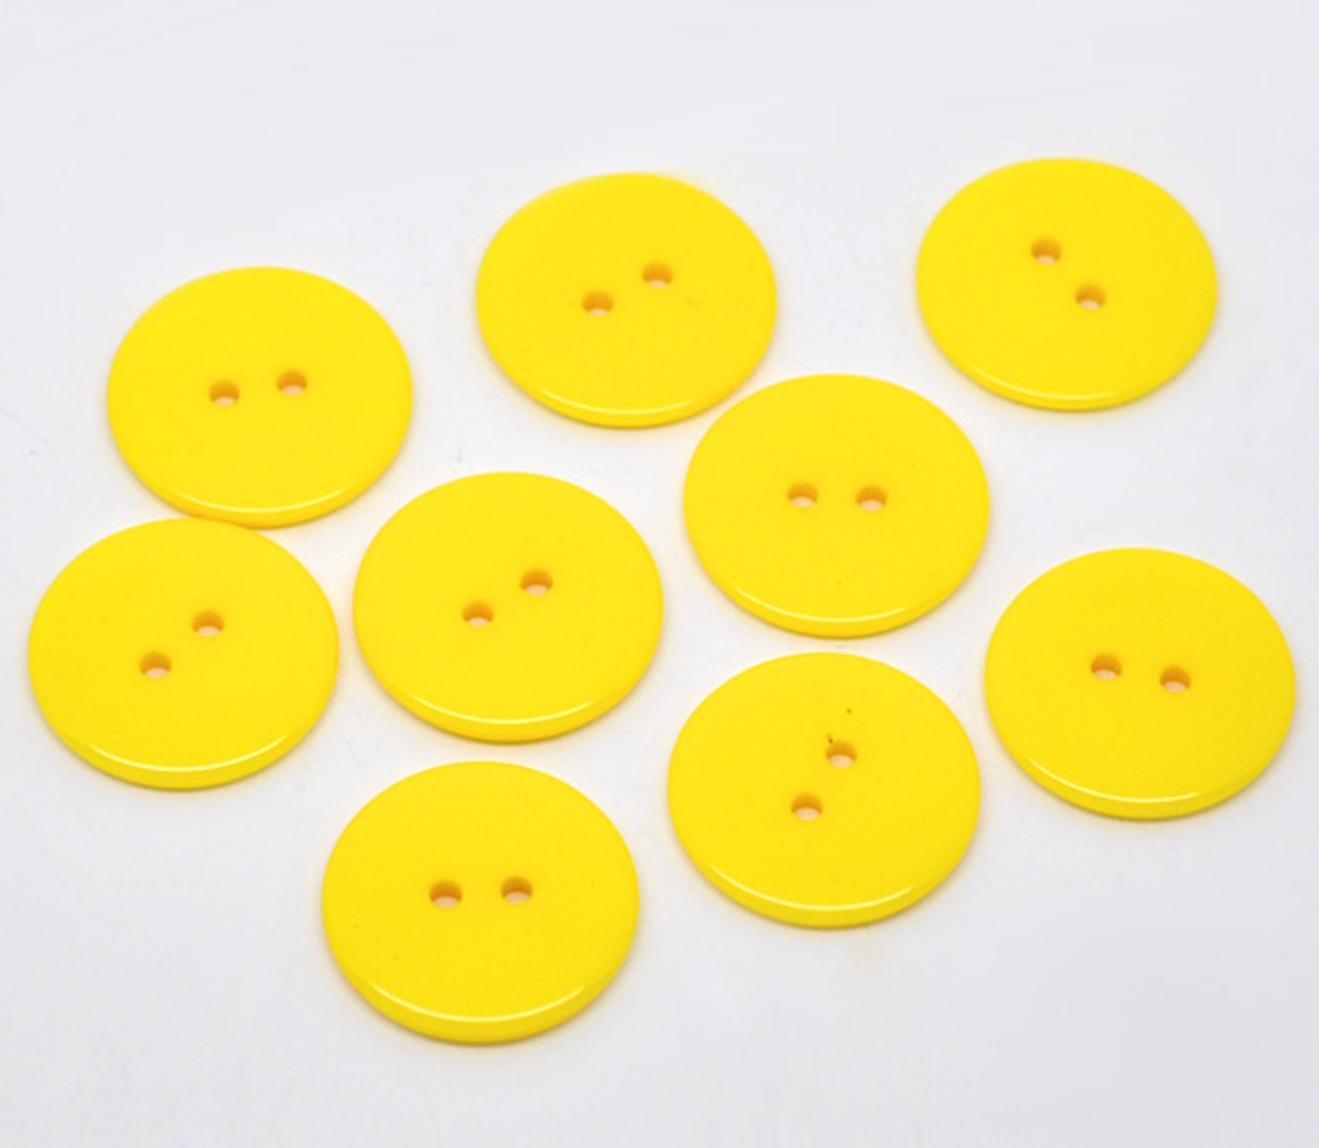 Yellow Daisy Shaped Button 2 Hole 23mm